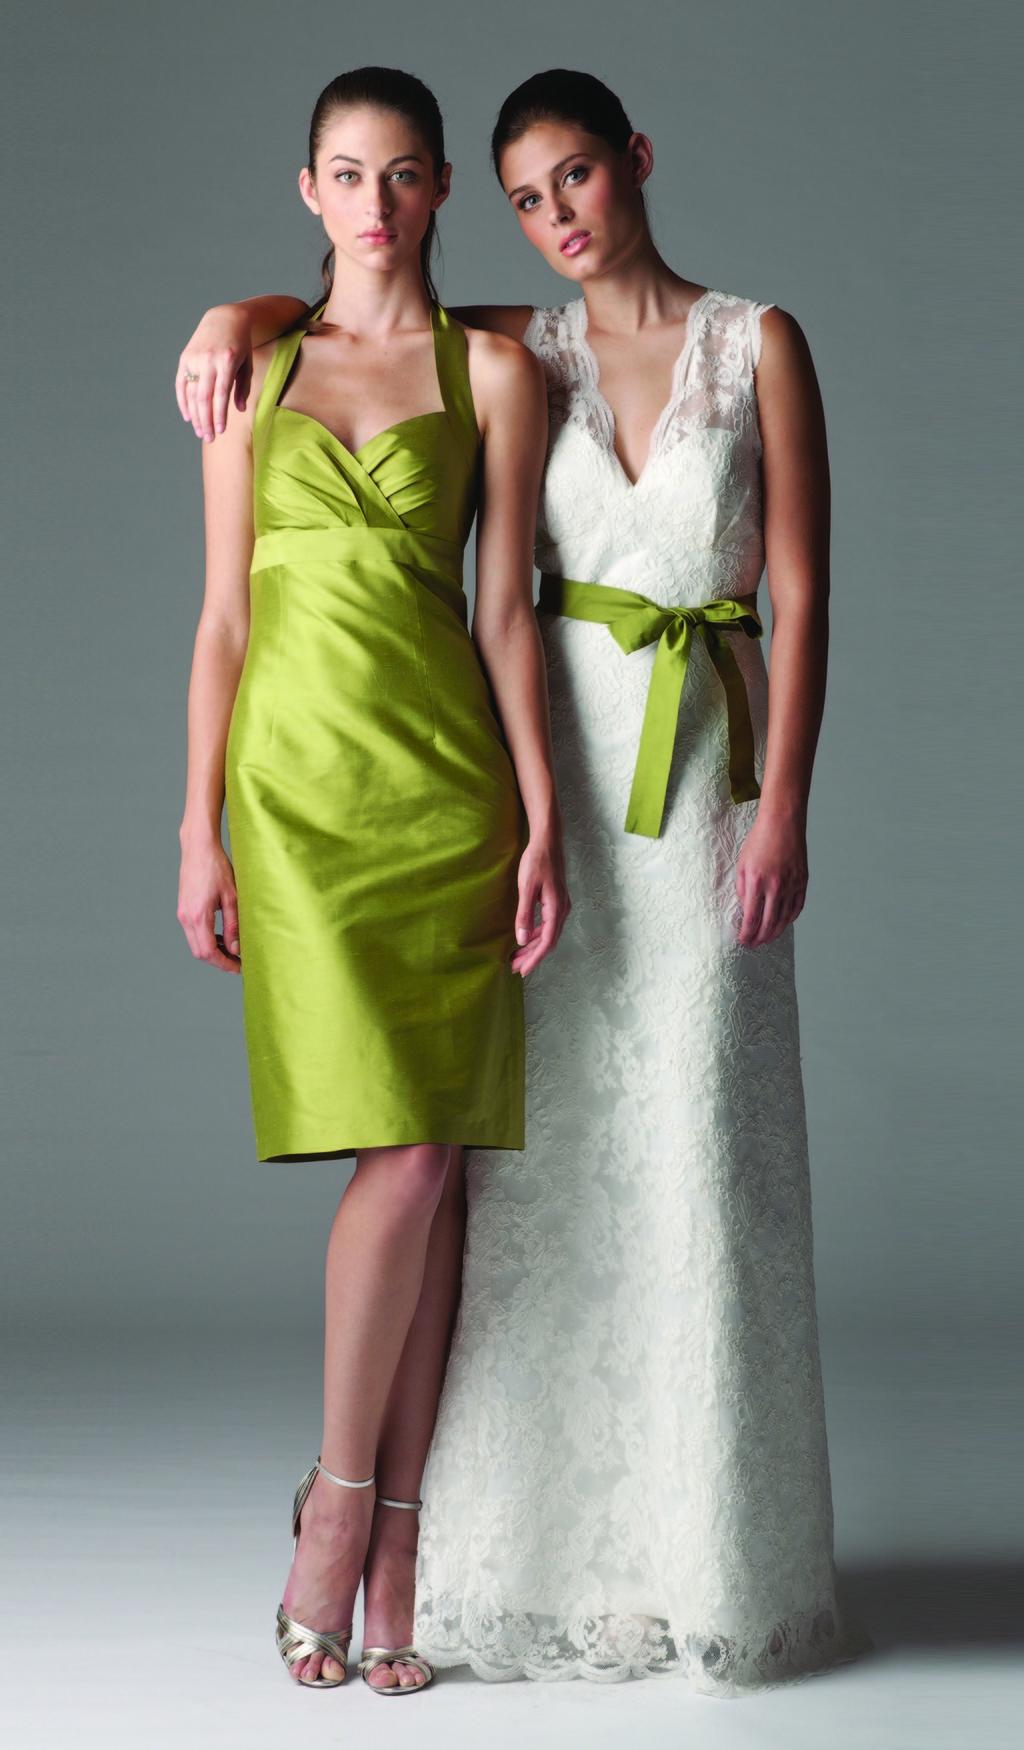 Aria-wedding-dresses-2012-bridal-gowns-bridesmaid-dress-green.full